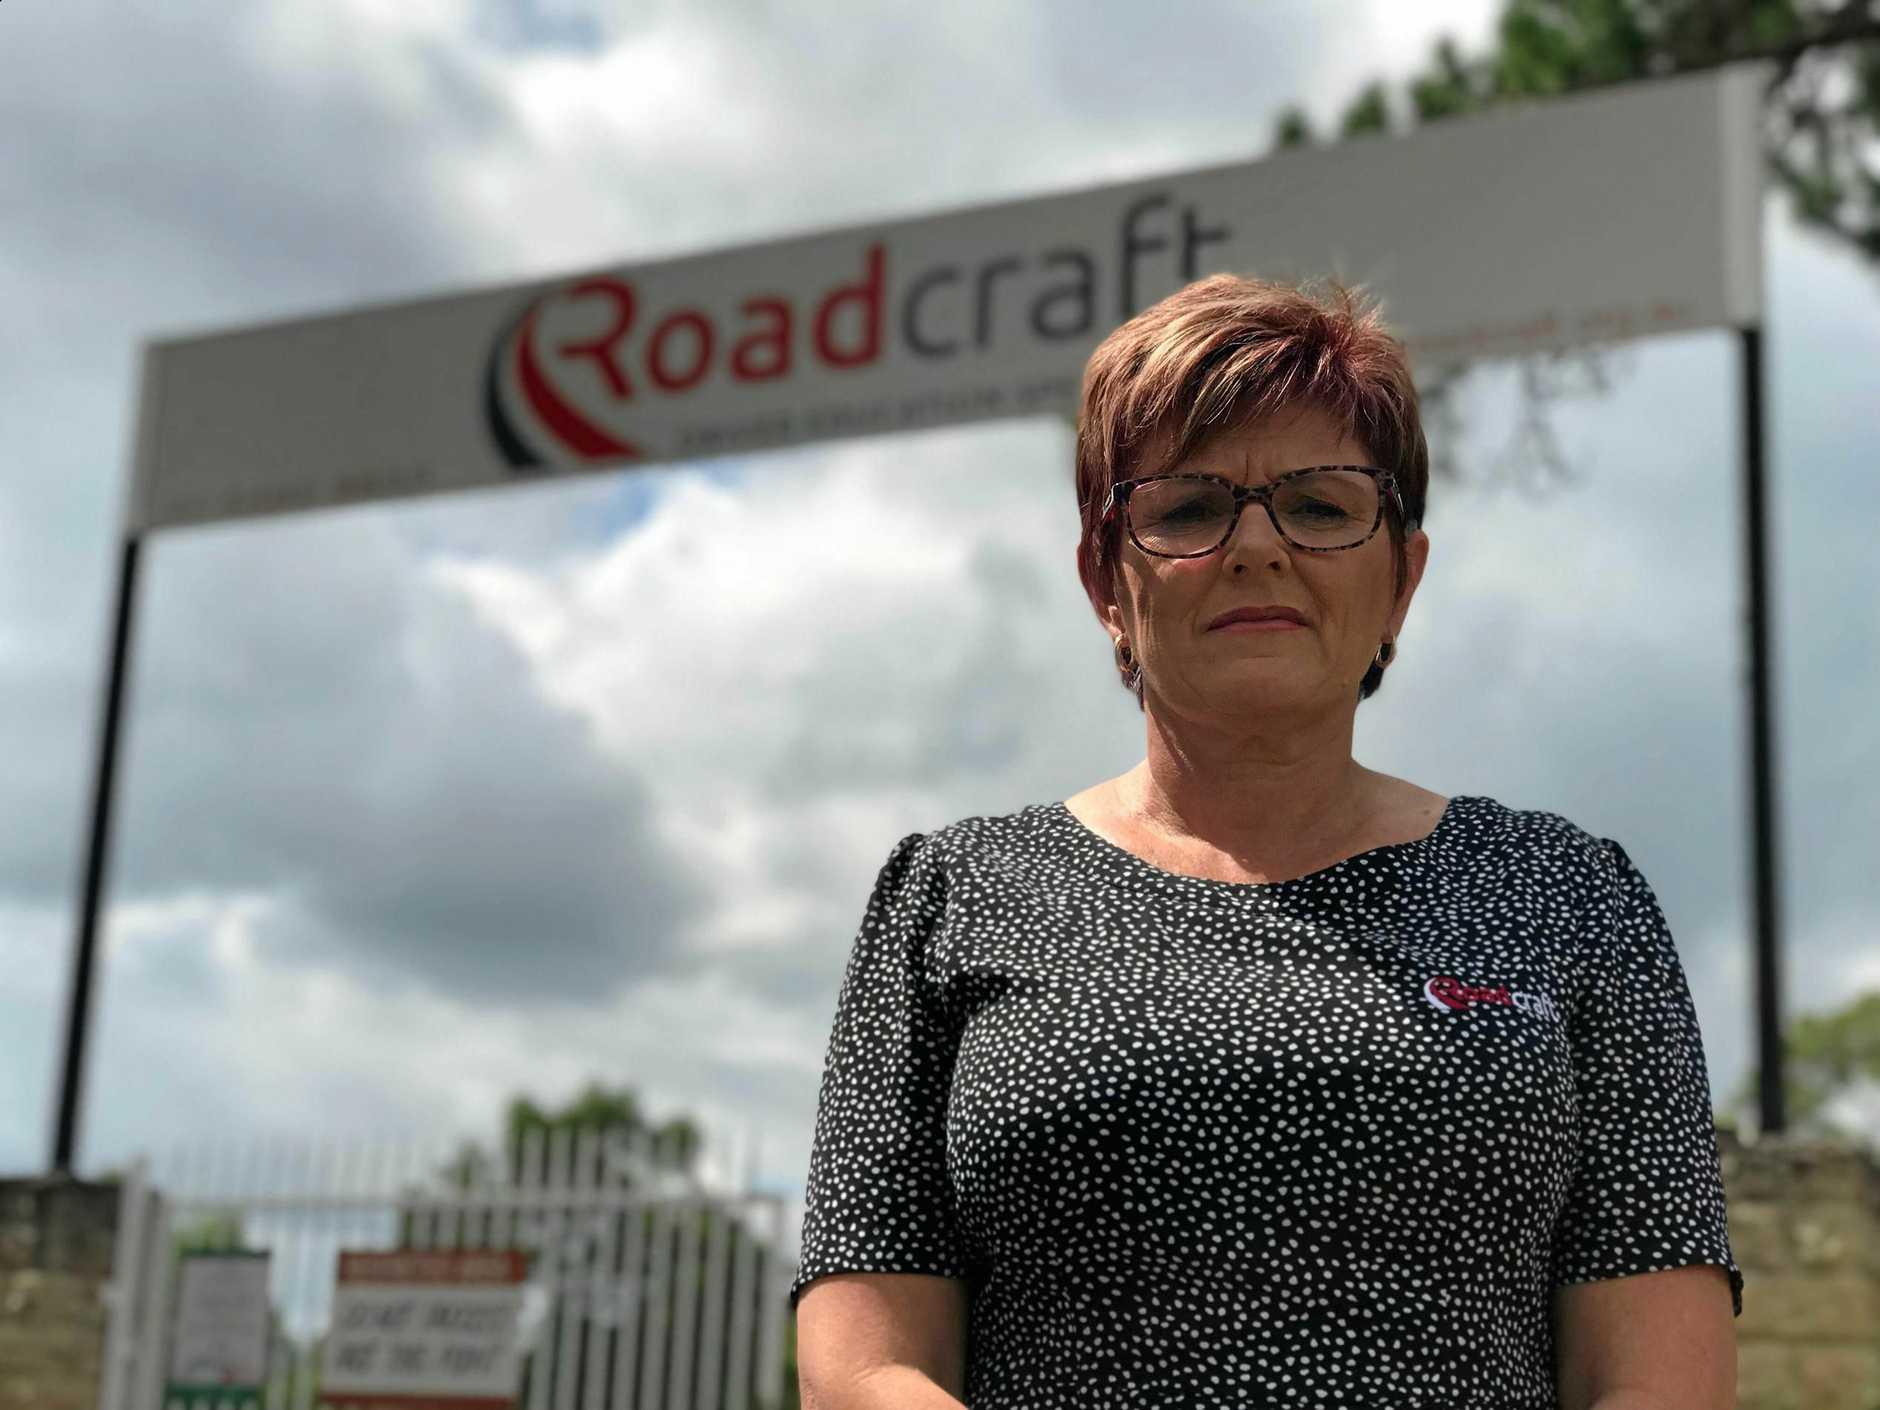 Roadcraft CEO Sharlene Makin.